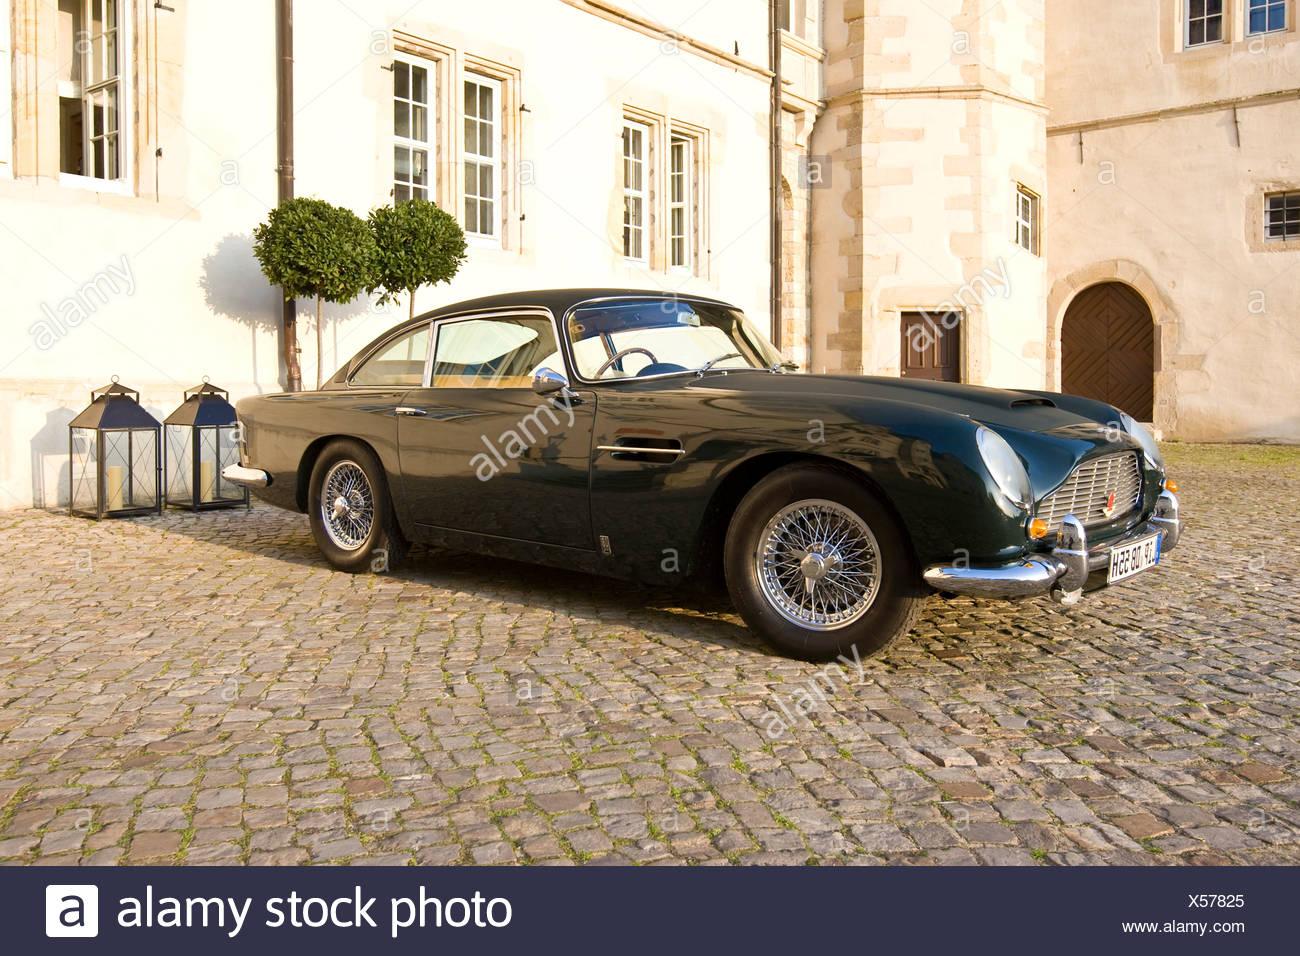 Aston Martin DB5, Aston Martin Meet, Lower Saxony, Germany, Europe - Stock Image